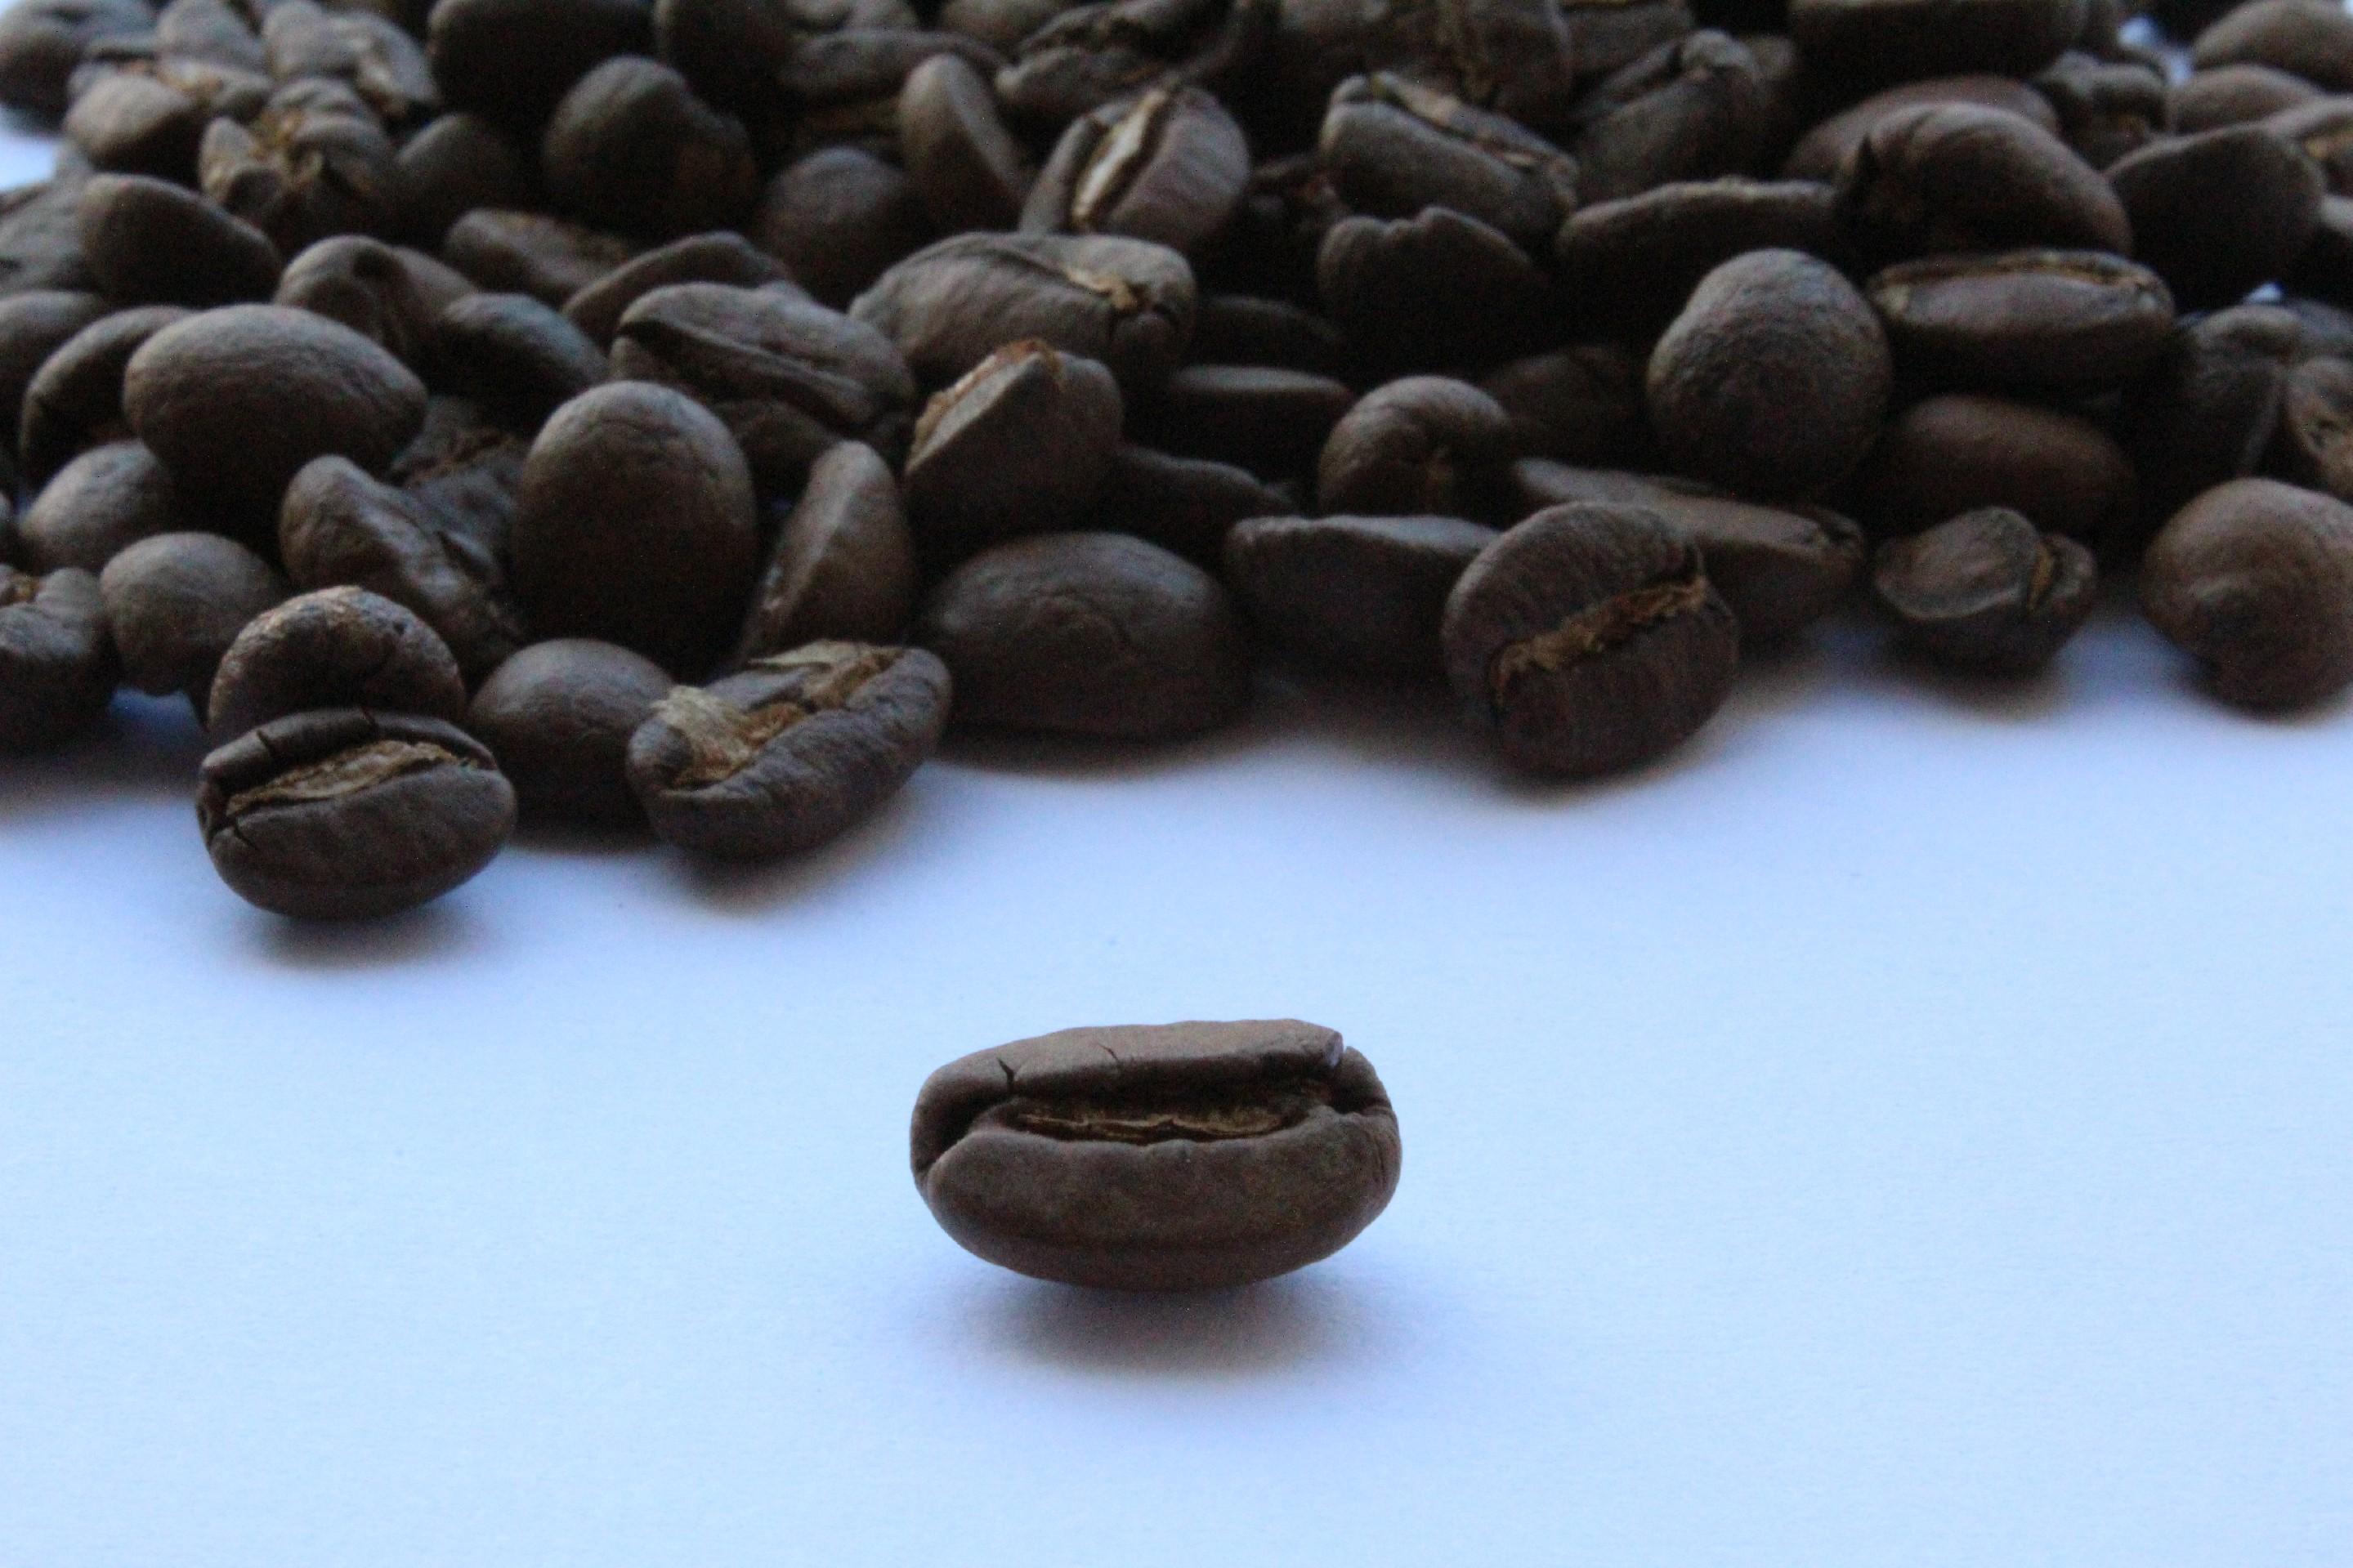 BotaCoffee Honduras SHG ep, Coop. Cocatecal, La Campa in Lempira (1kg) Mletí kávy: Zrnková